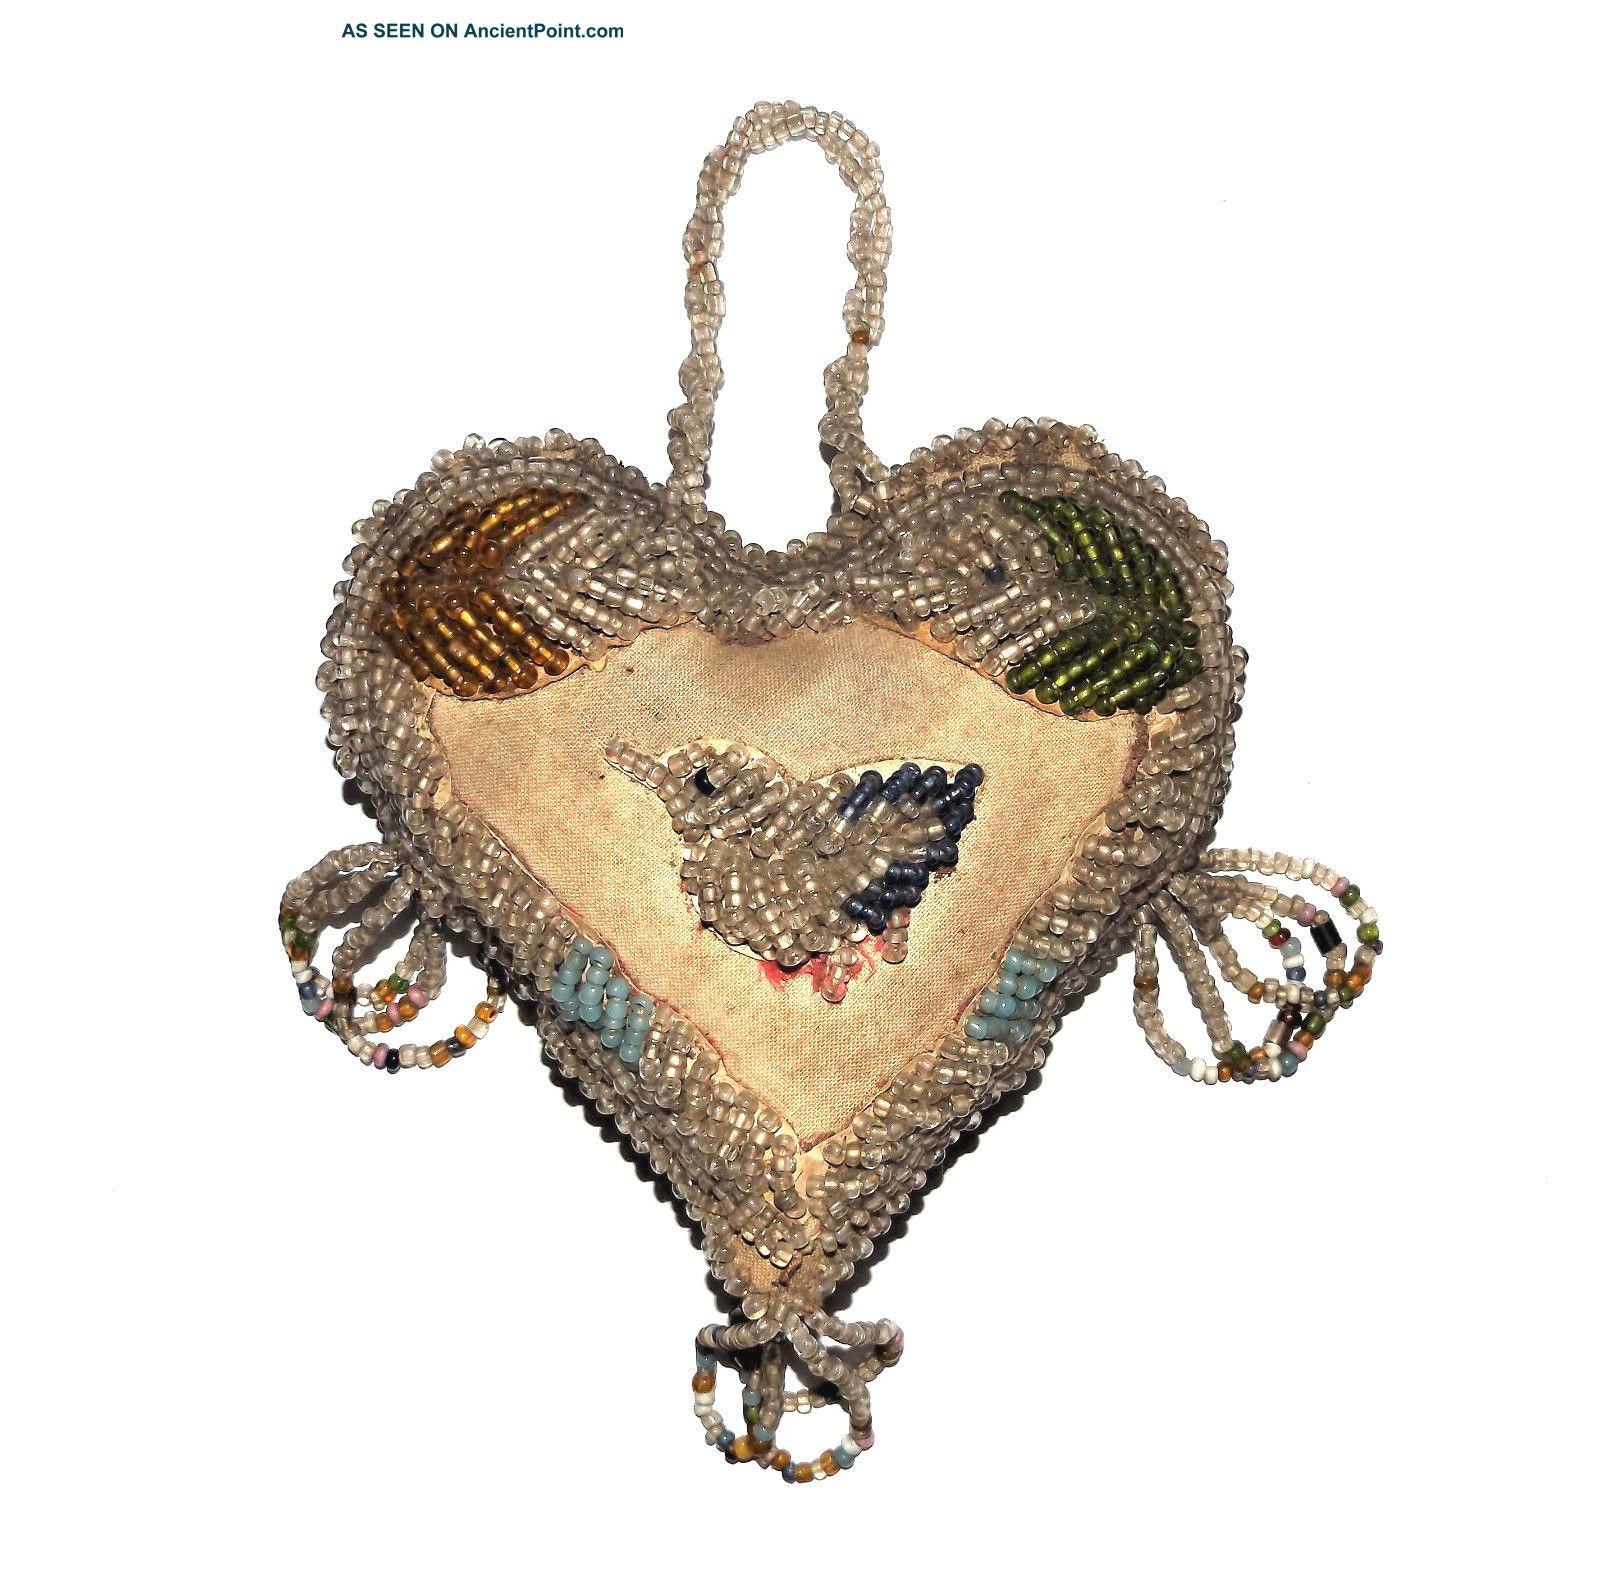 Antique Iroquois 1900 Native American Indian Vtg Beadwork Bird Heart Pincushion Native American photo